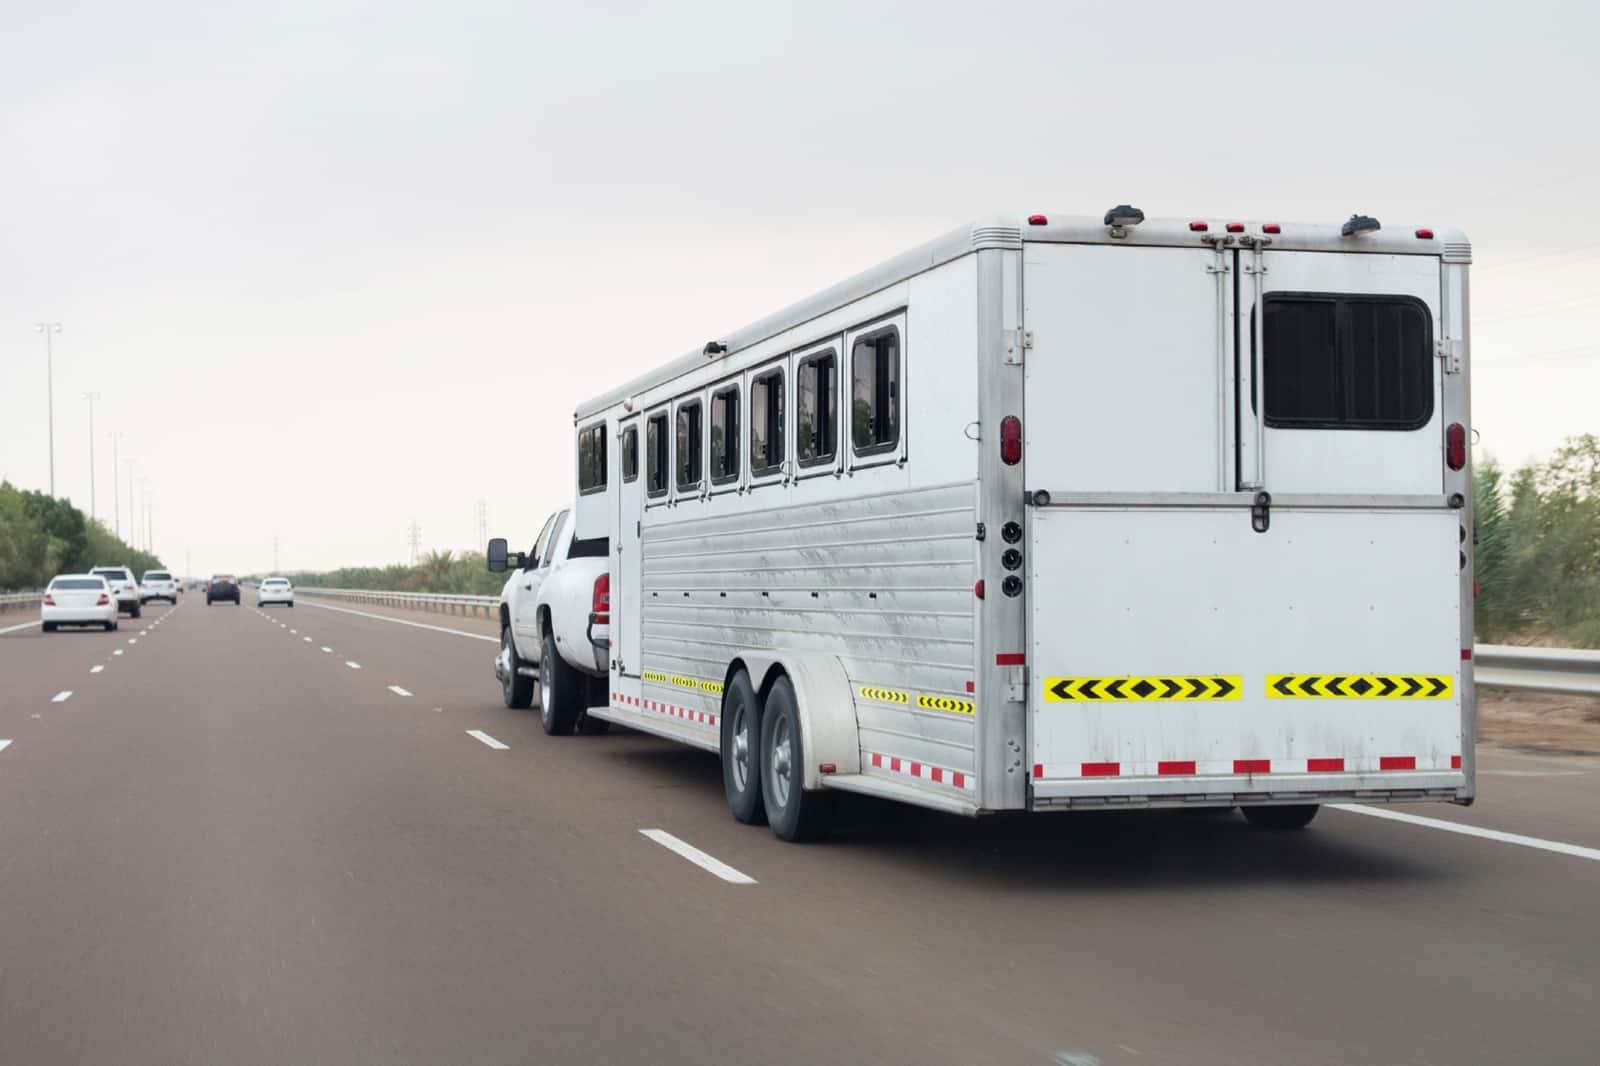 Wildfire Season: Horse Evacuation During COVID-19